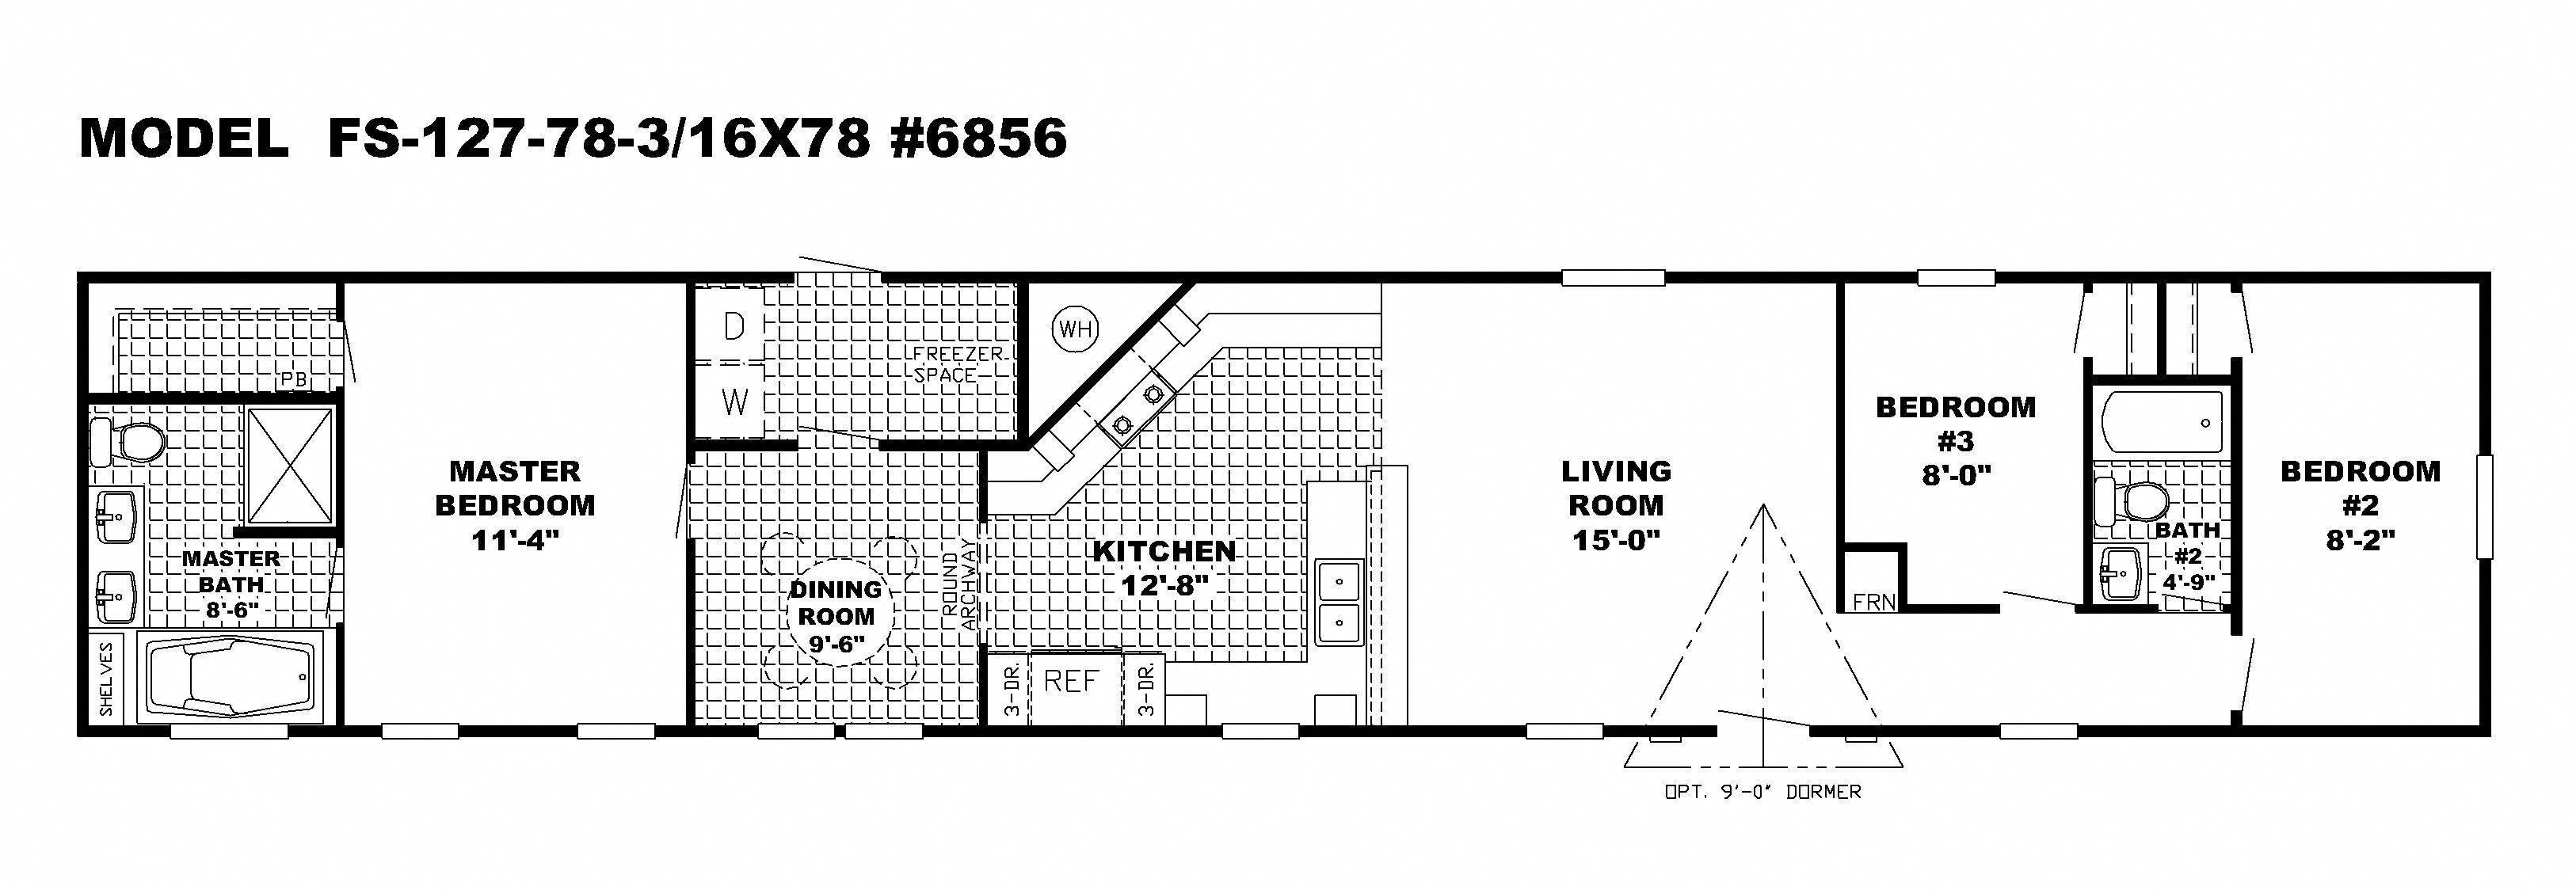 Floor Plans Mobile Homes Single Widesingle Wide Mobile Home Floor Plans Skyline Single Wide Mobile Home Floor Plans Single Wide Mobile Homes House Floor Plans